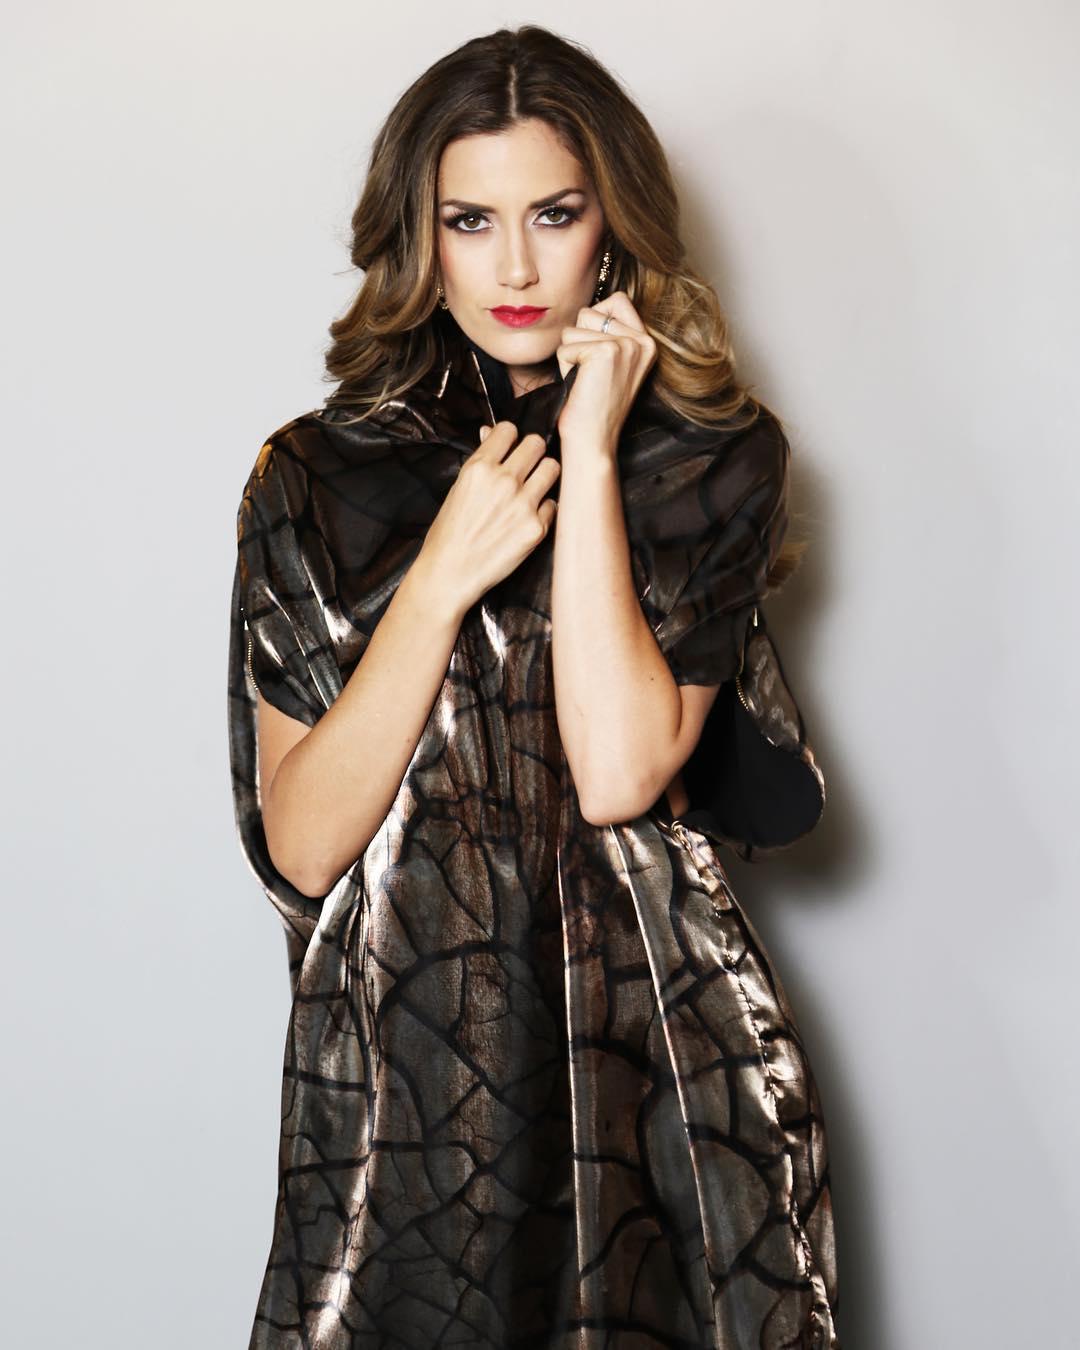 jessica mcfarlane, 7 finalista de reyna hispanoamericana 2018. - Página 2 29739310